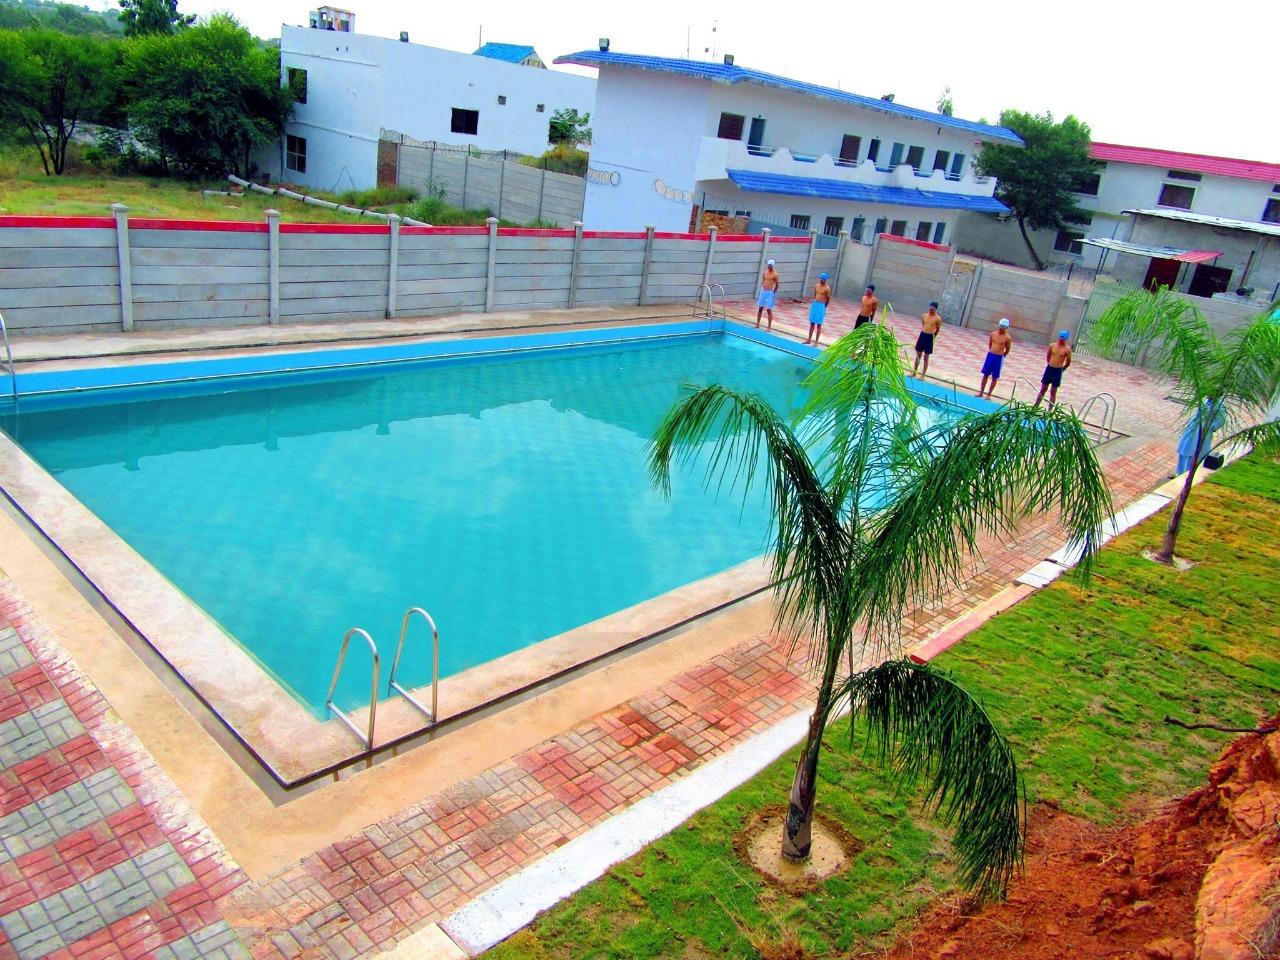 CCF-76.5856565332905-swimming-pool.jpeg